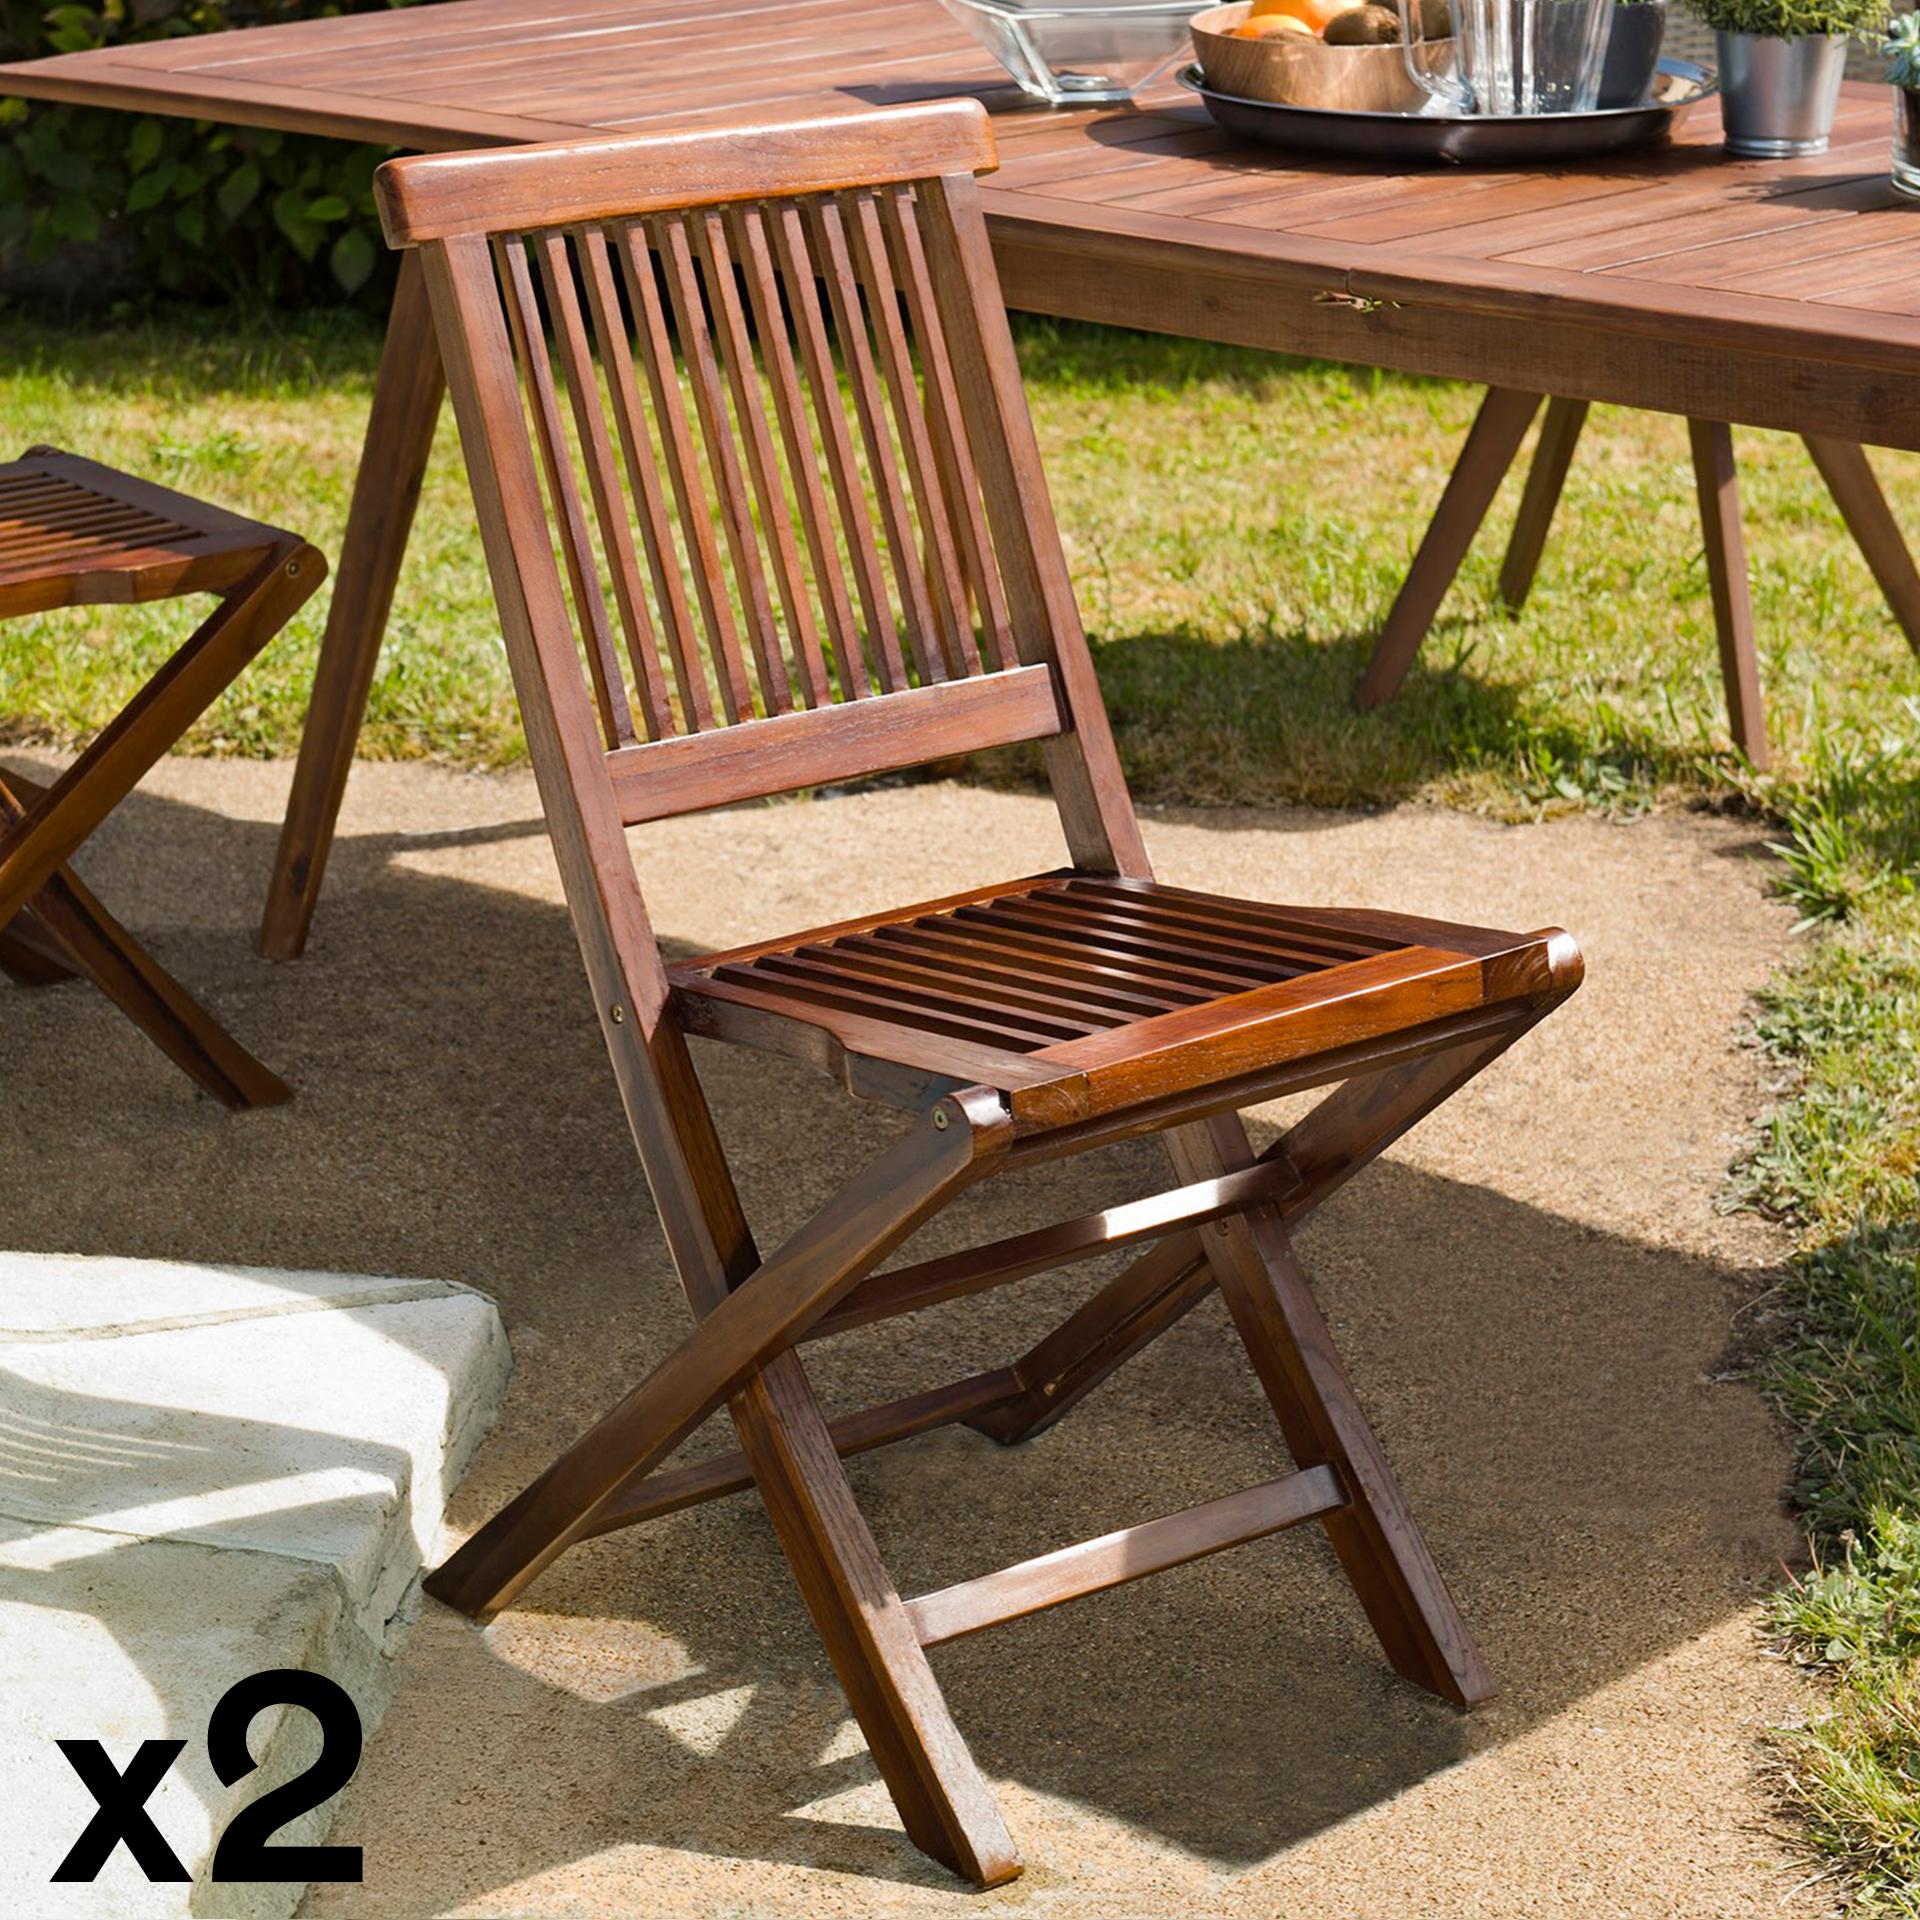 lot de 2 chaises de jardin en teck massif huile 45x60x90cm macao